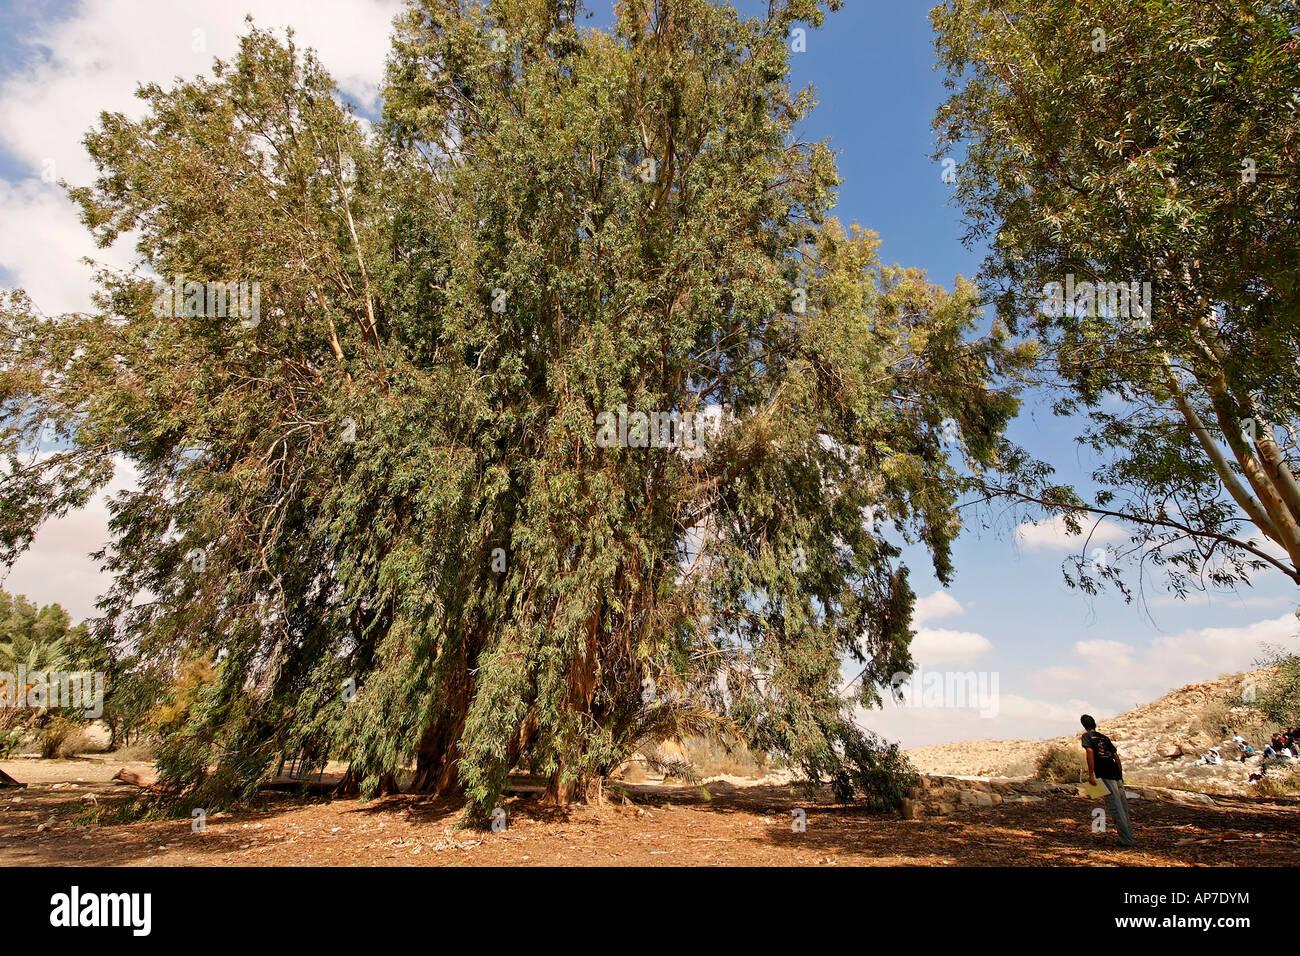 Israel the Negev Desert Eucalyptus tree in Be erotaim Stock Photo